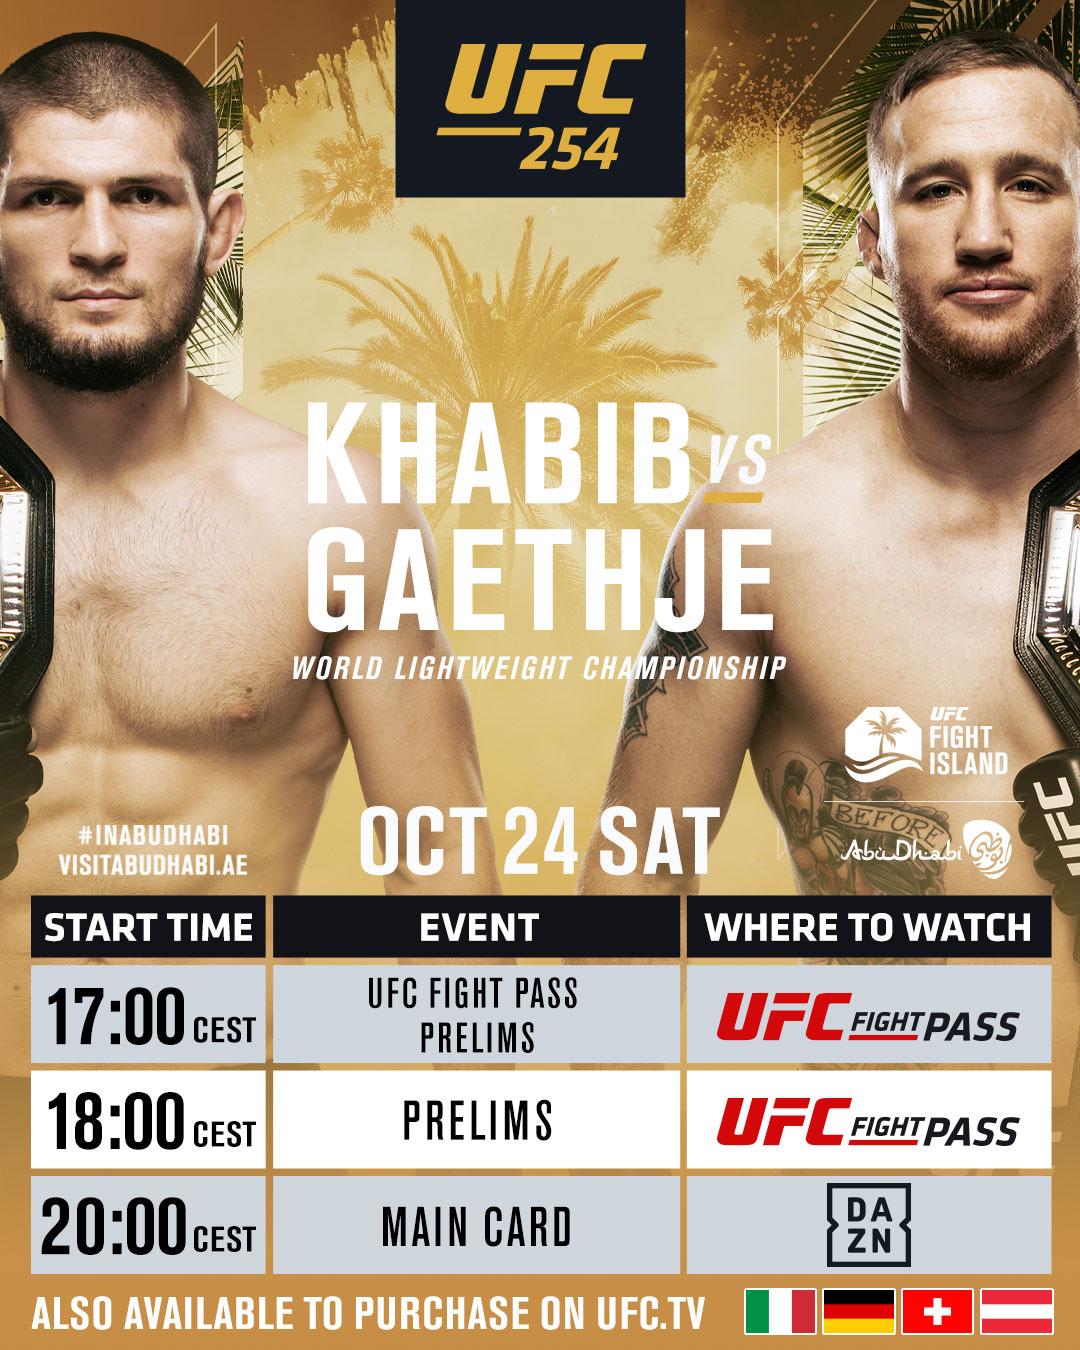 Khabib vs Gaethje Livestream